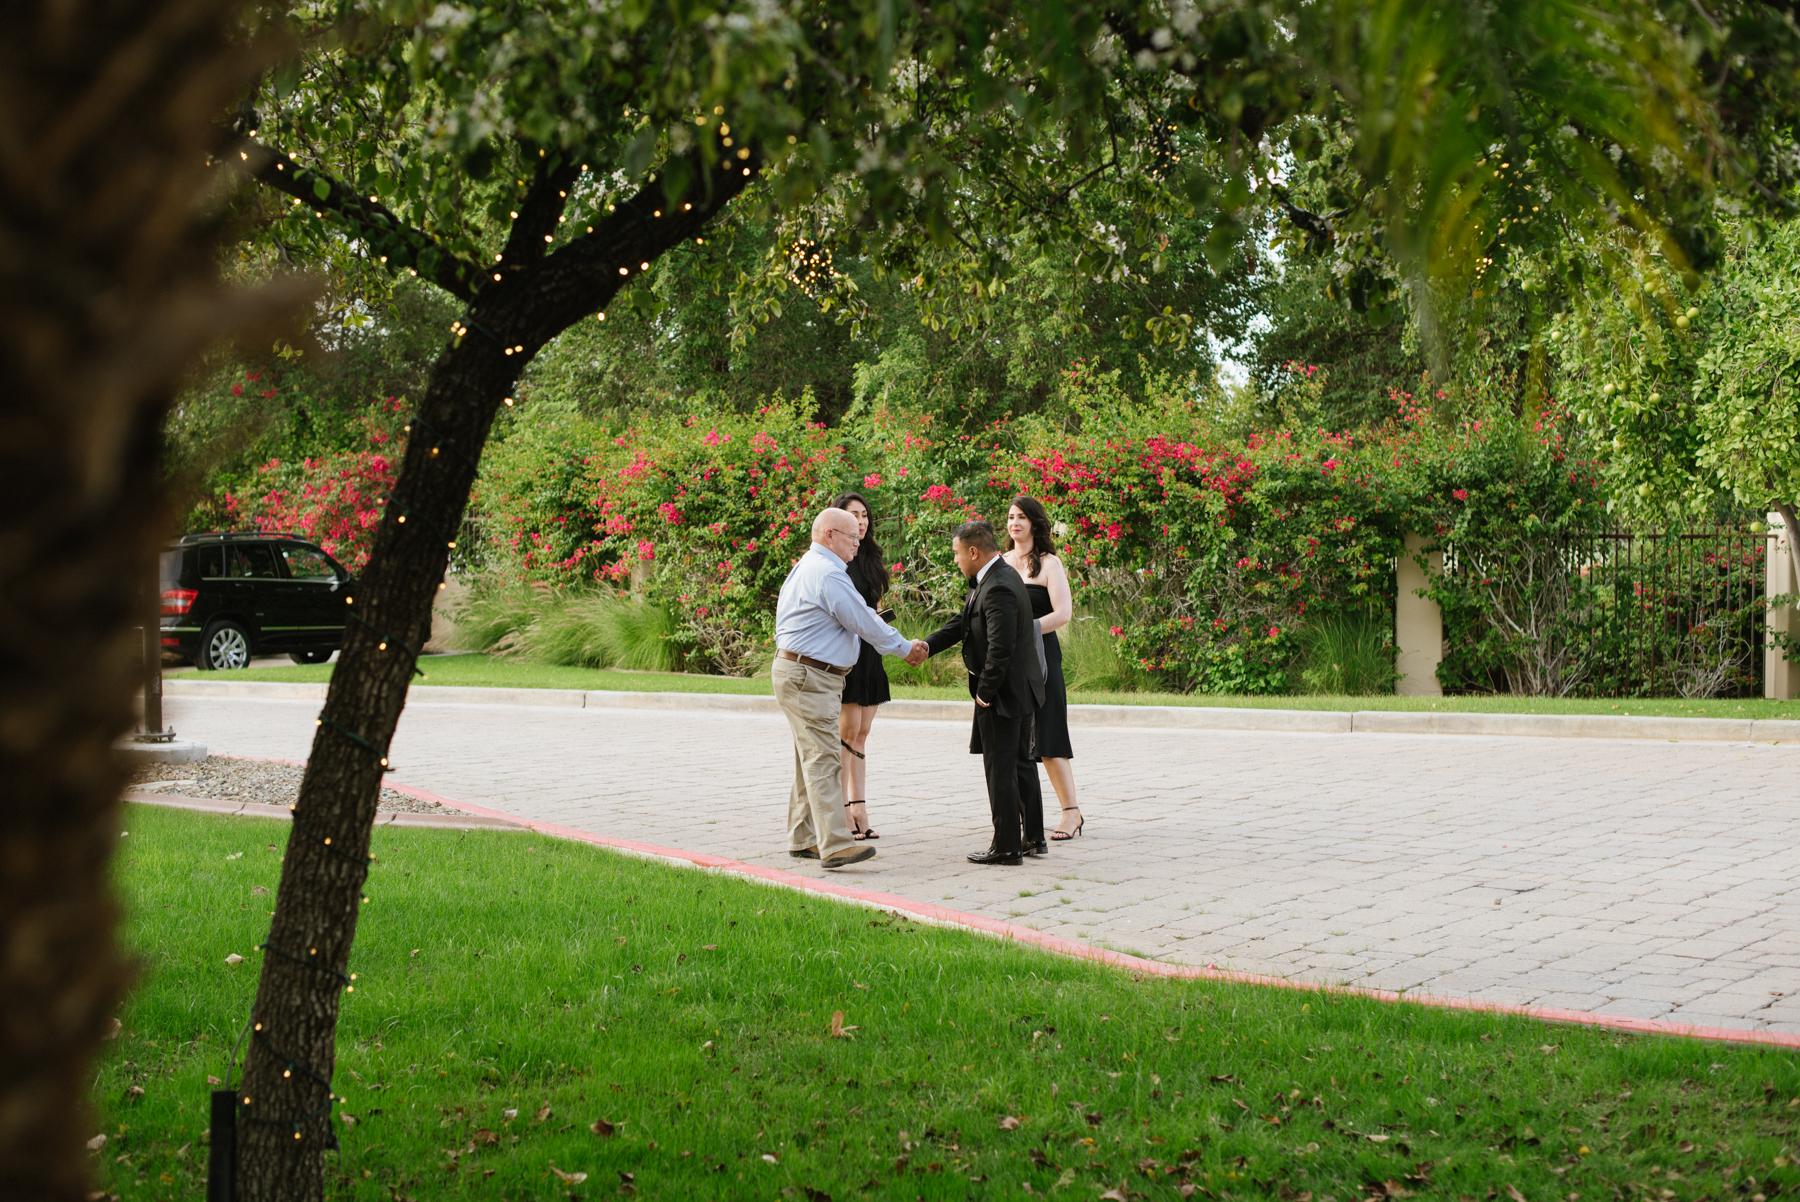 Secret Garden Event Center Wedding - Meredith Amadee Photography-73.jpg